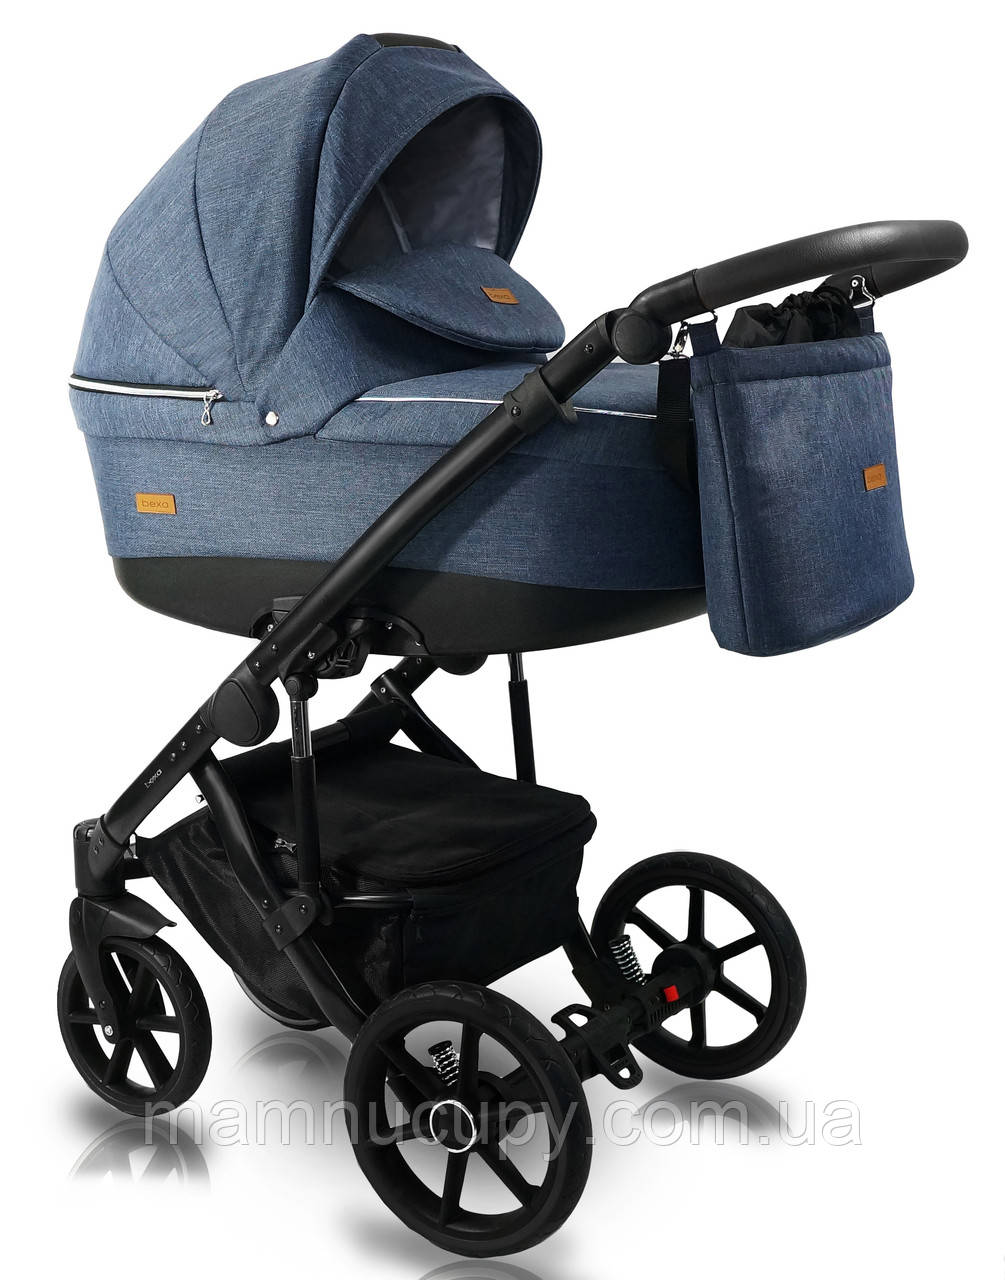 Дитяча універсальна дитяча коляска 2 в 1 Bexa Ultra 2.0 Ult2 (бекса ультра 2.0)